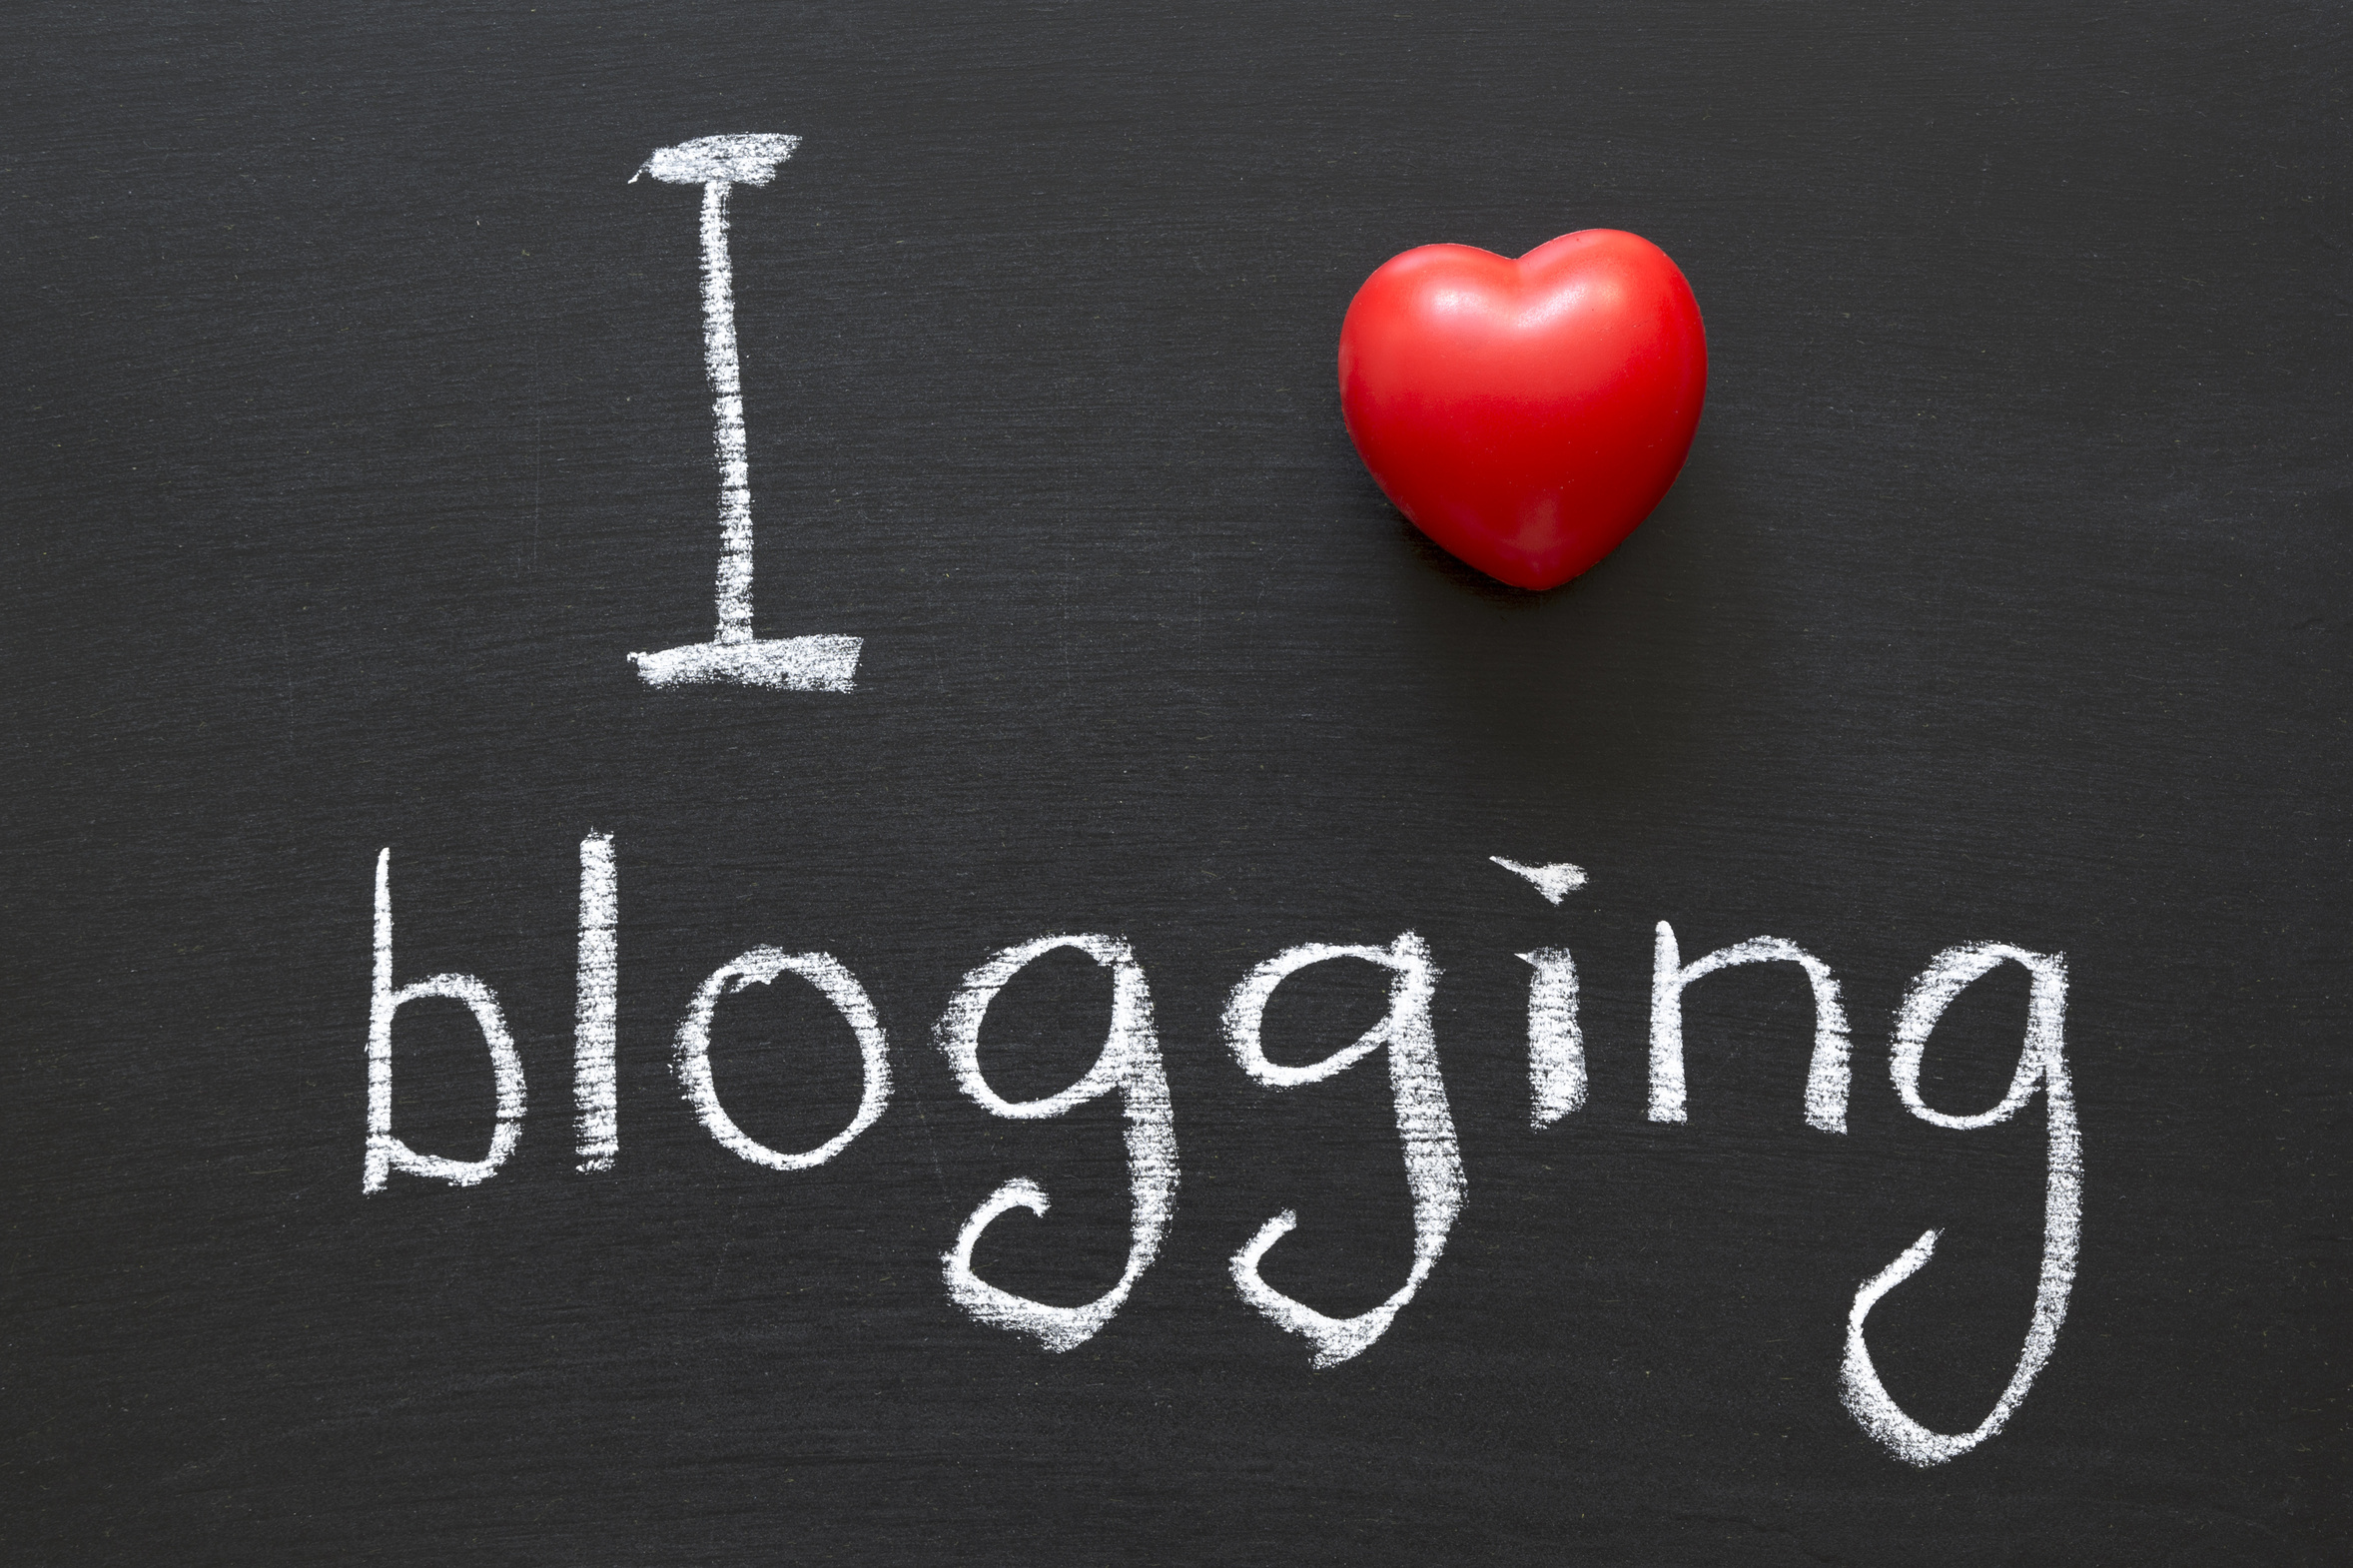 Organizando mi caos con blogs